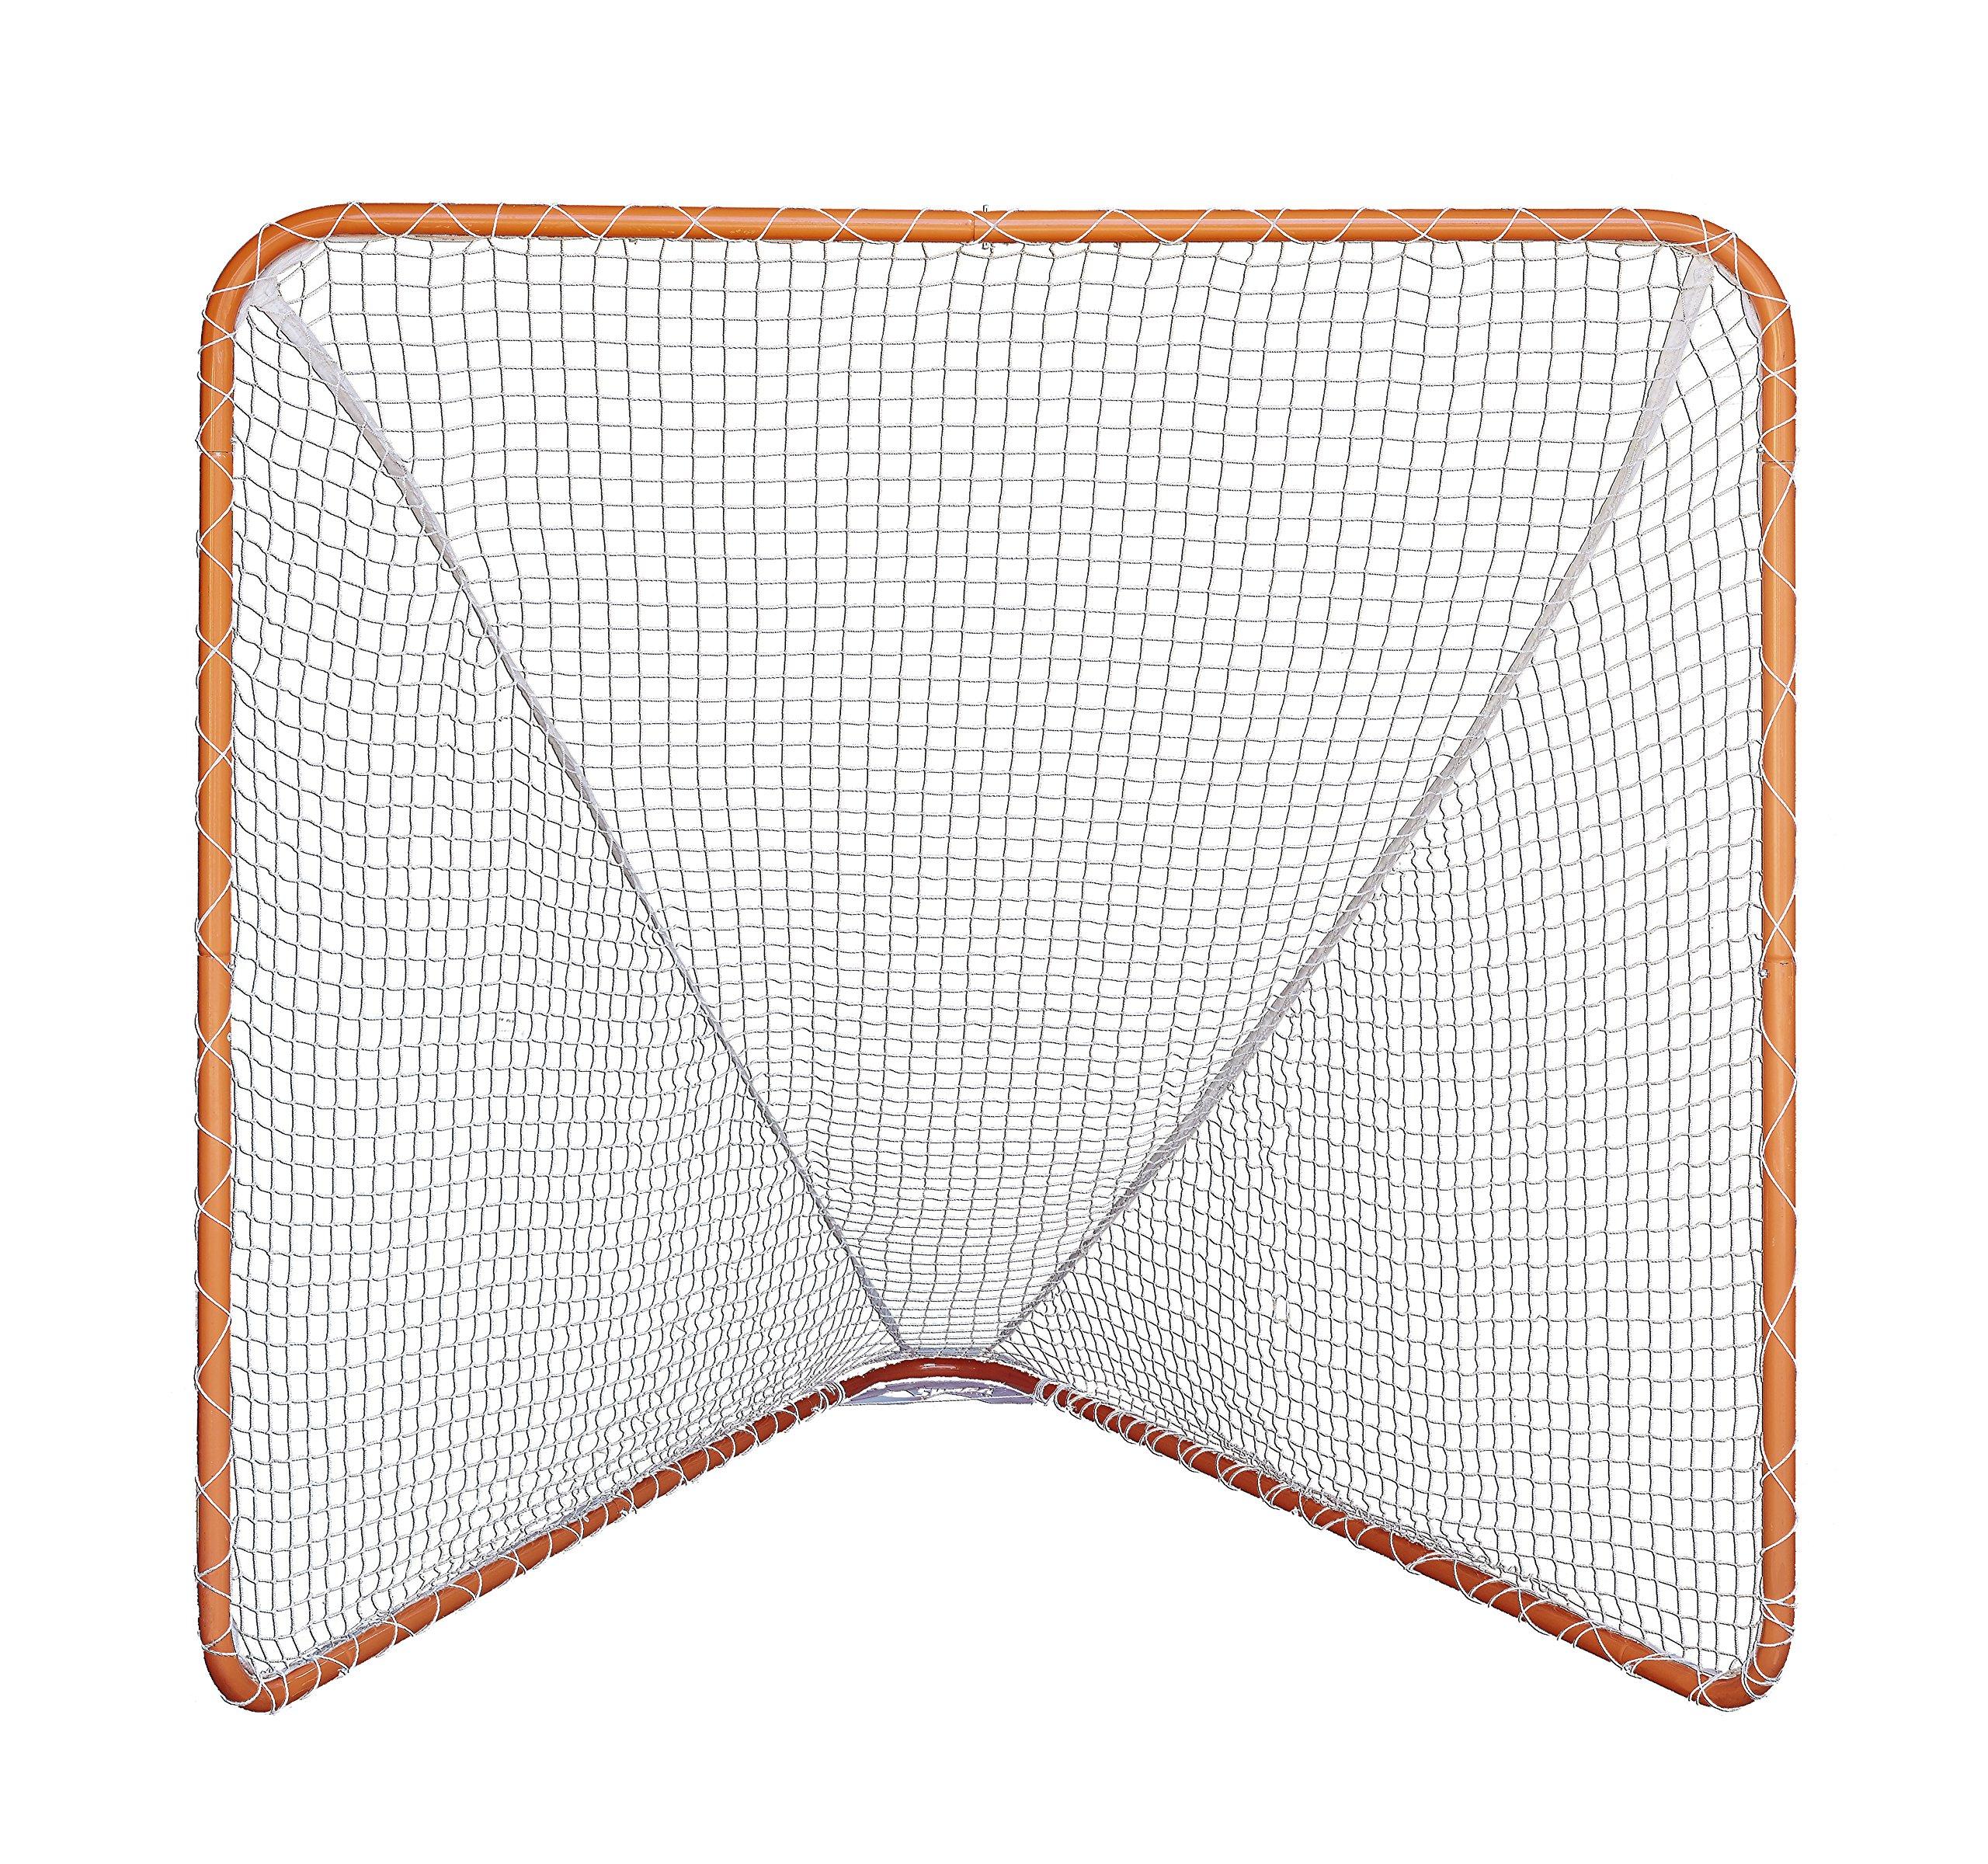 SWAGA Lacrosse Goal with Net - Orange 100% Steel Frame - 6 x 6 Foot